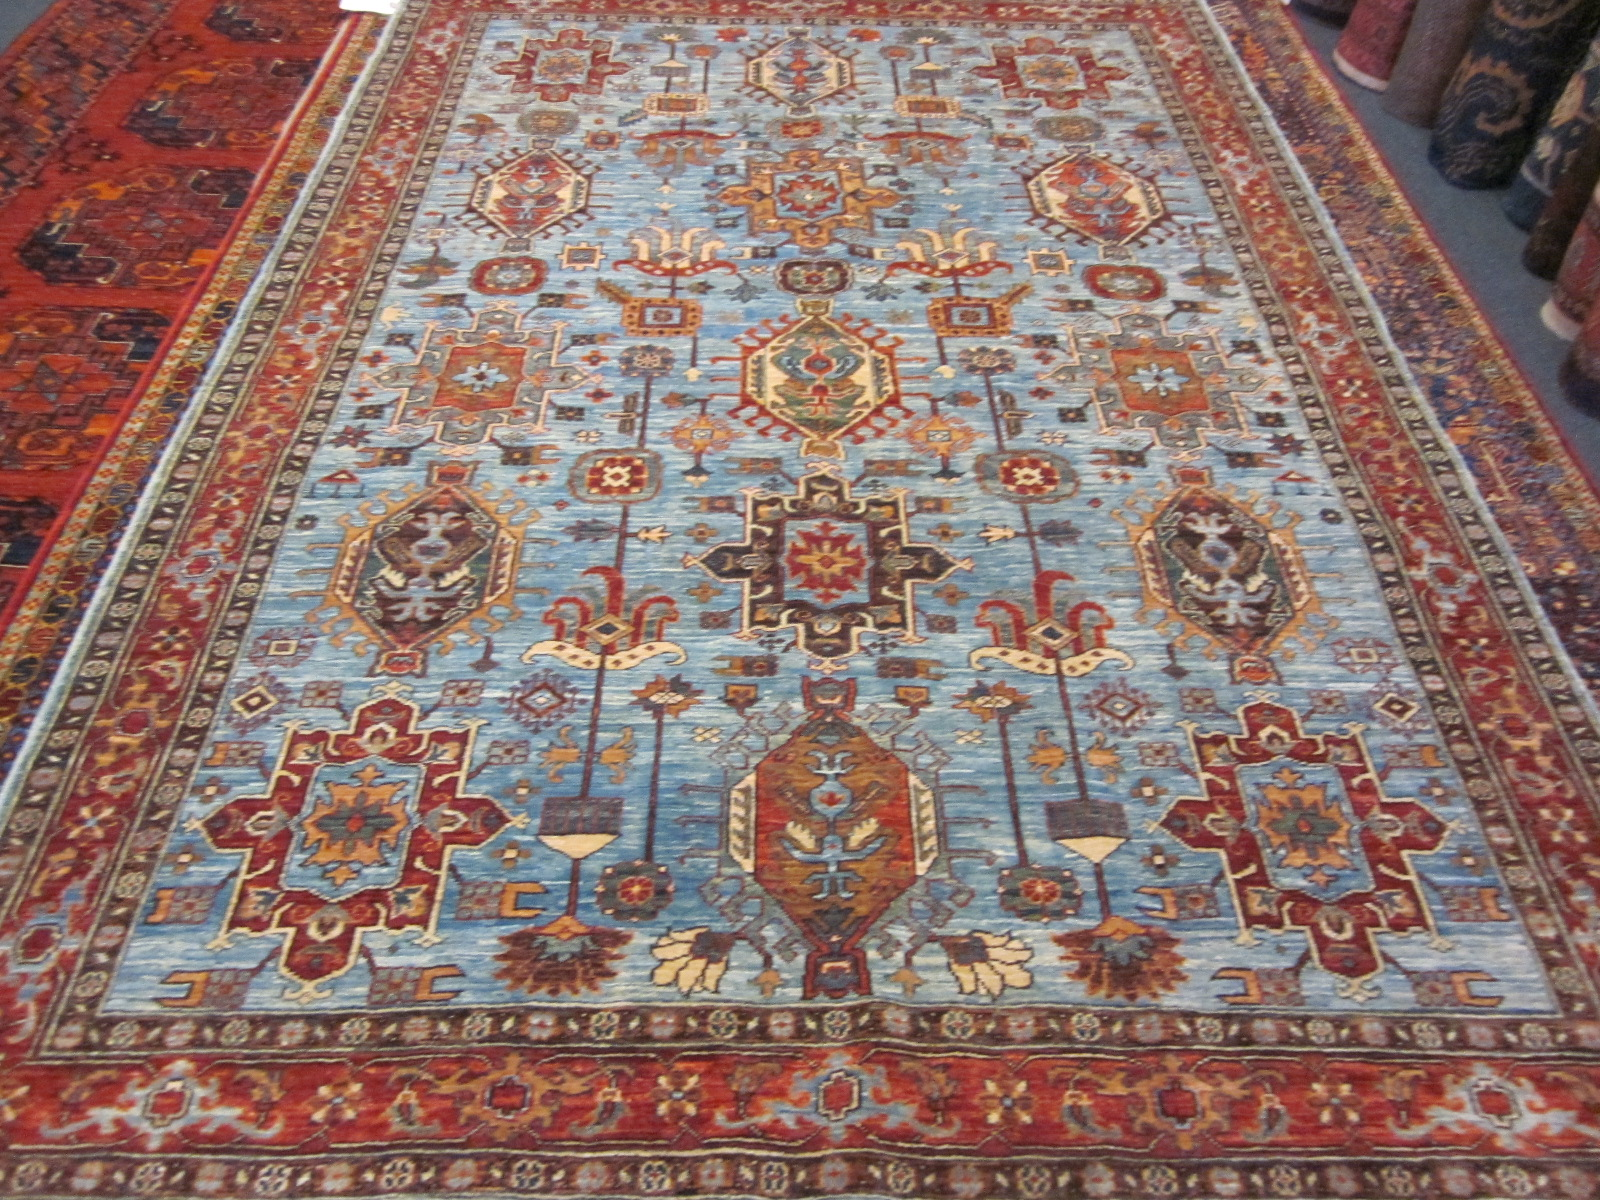 5x7-Gorgeous-Afghan-tribal-rug-for-sale.JPG